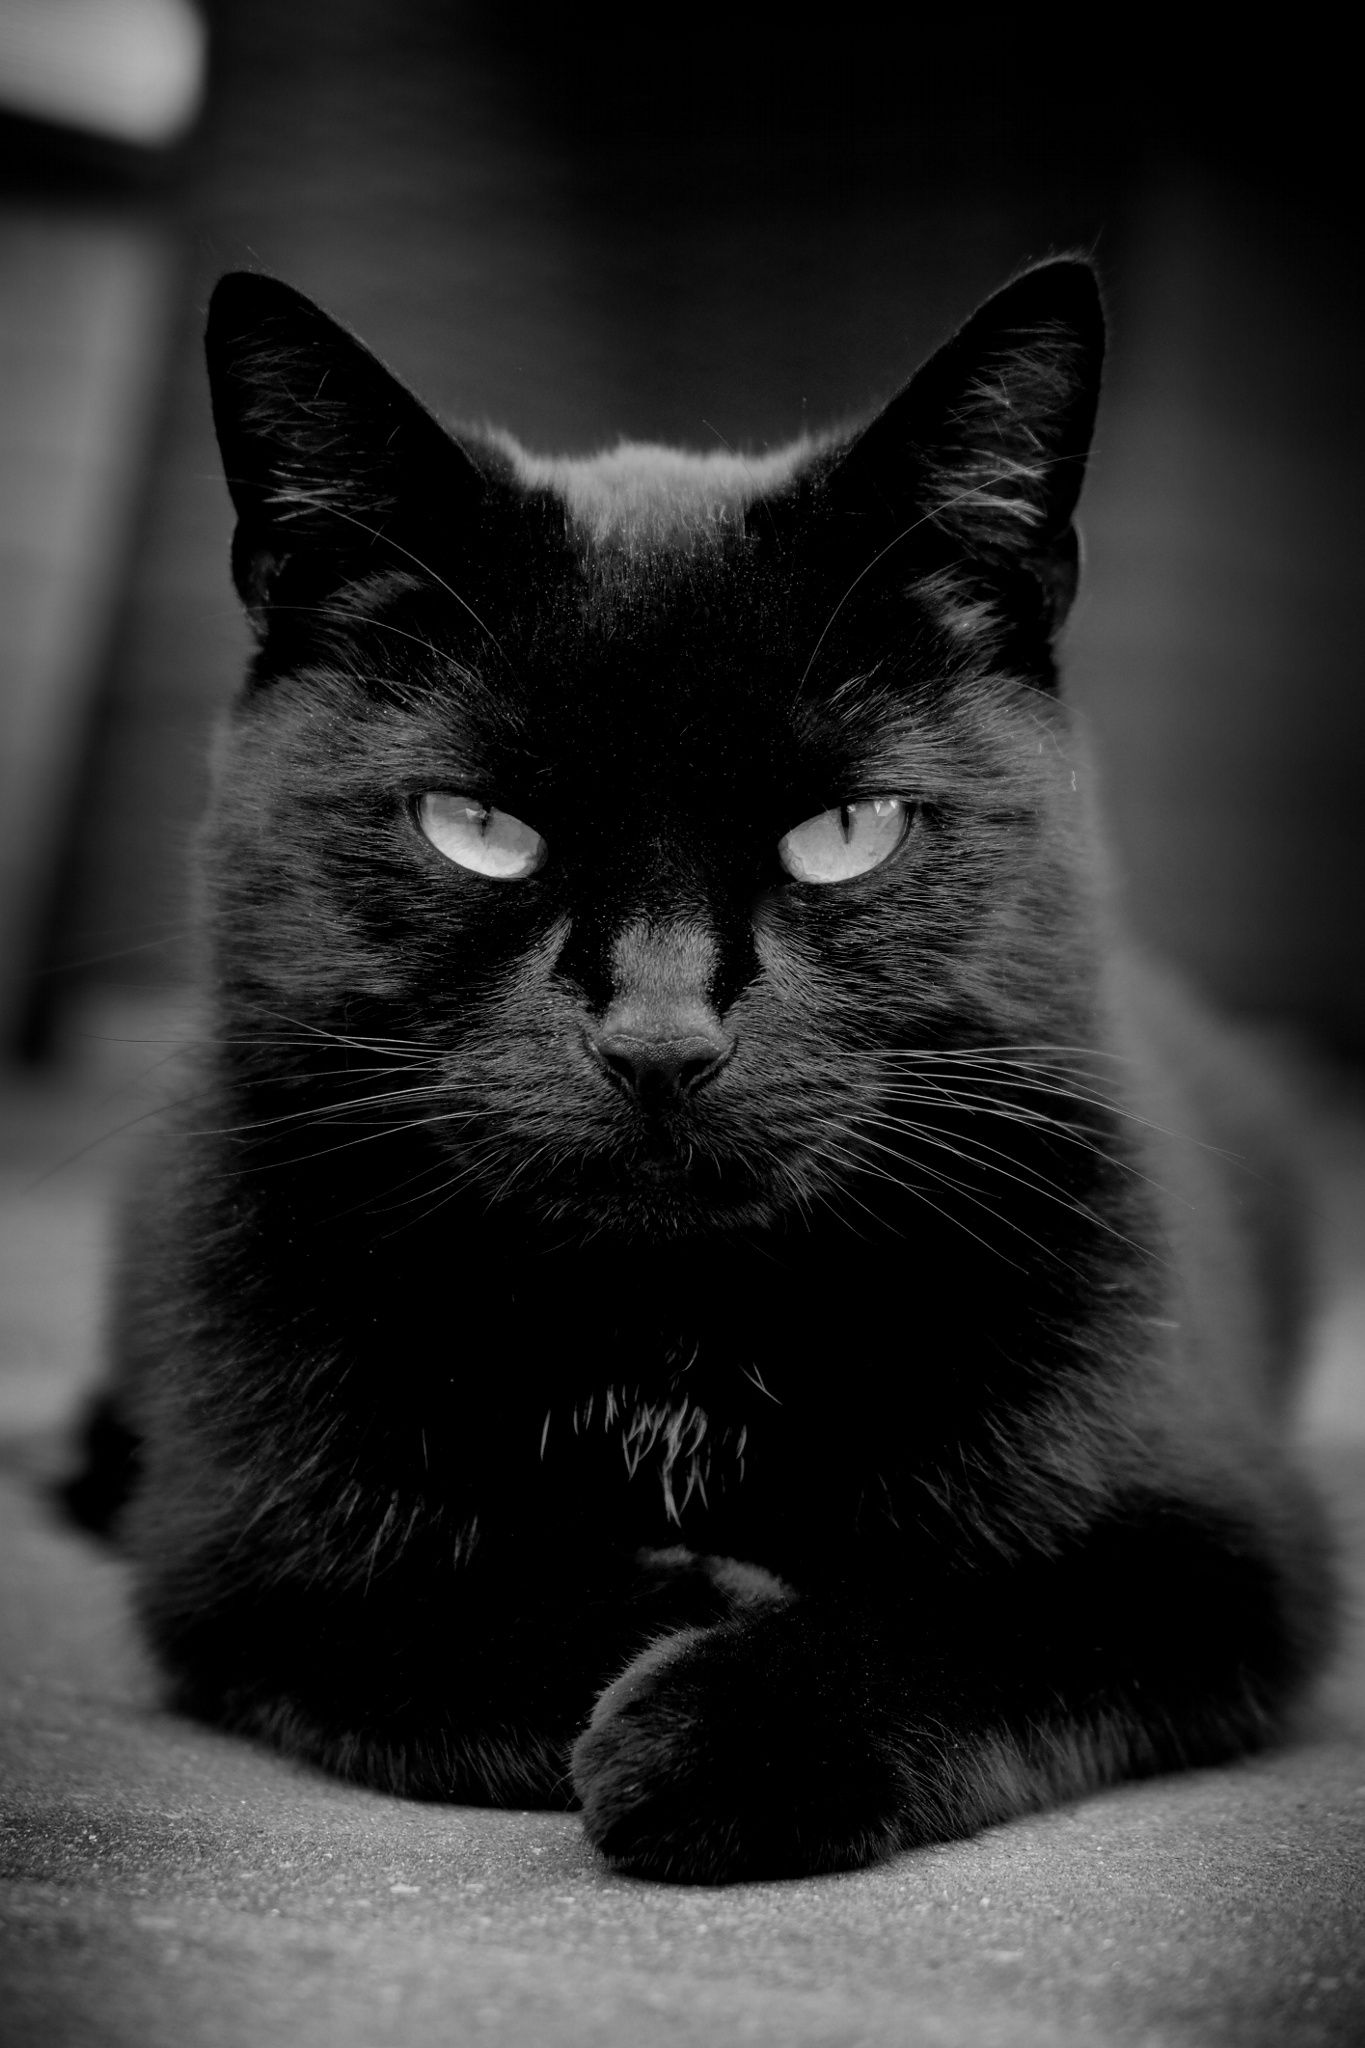 Photo: My black cat!  Little Black Panther by Linda Romviel on 500px